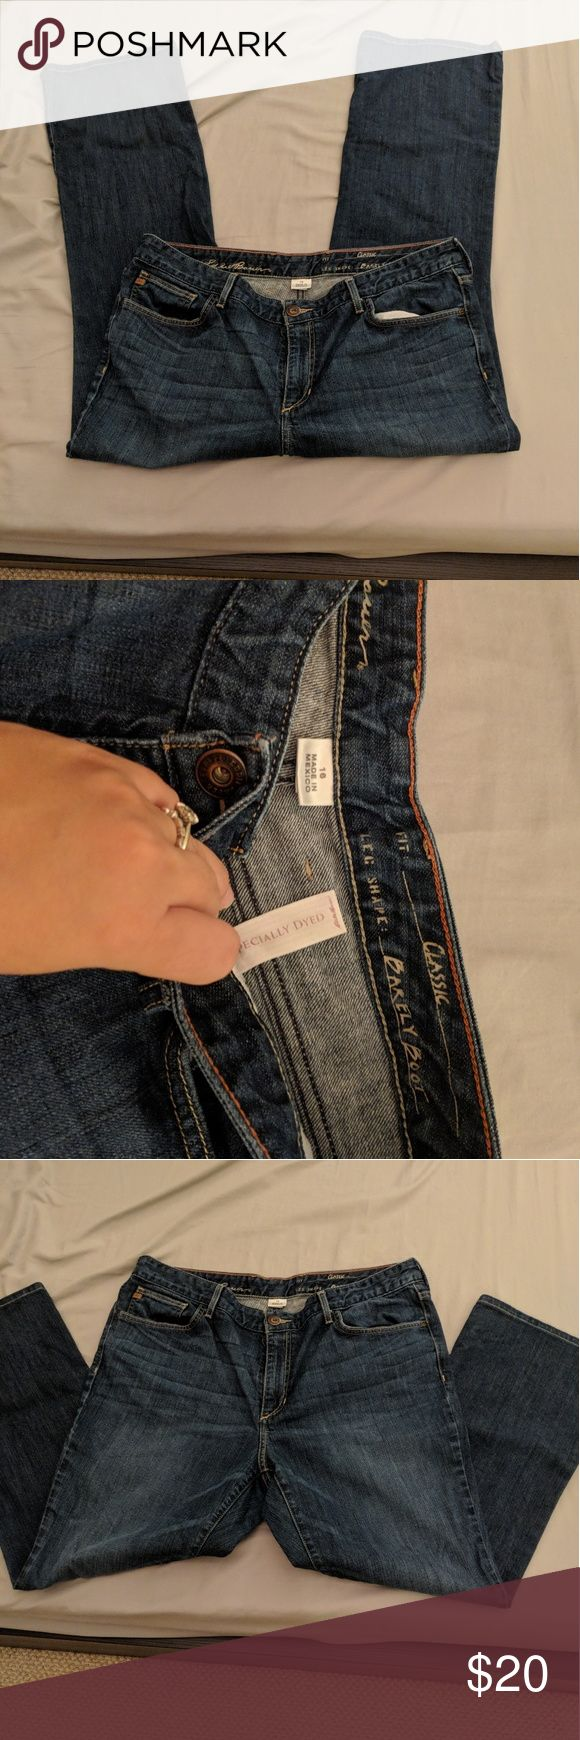 Eddie Bauer Womens Jeans Fit Classic, Leg Shape Barely